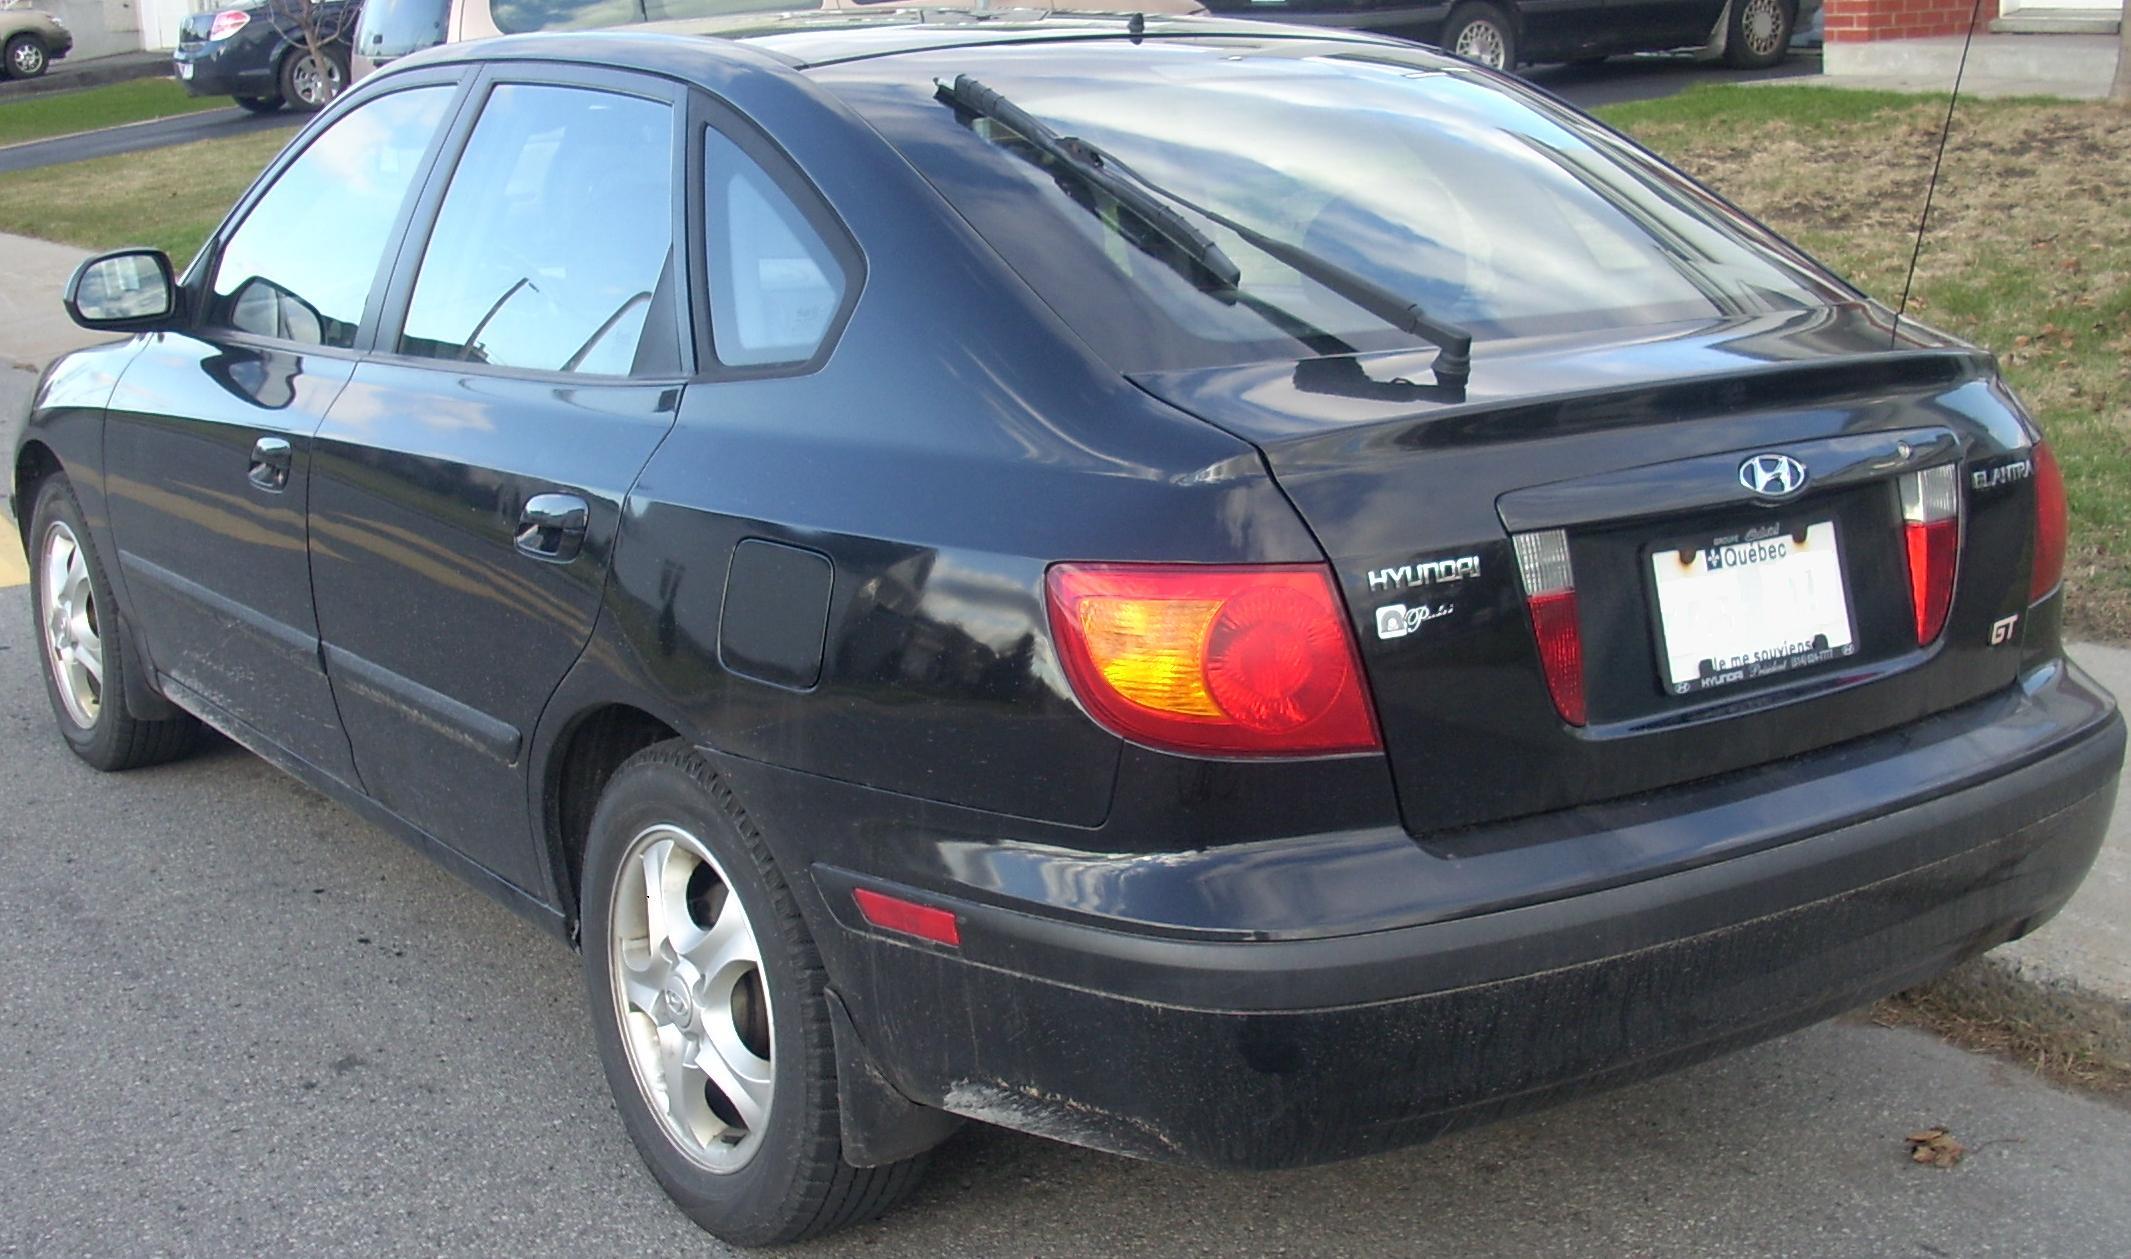 File:'02-'03 Hyundai Elantra GT Hatchback.JPG - Wikimedia Commons